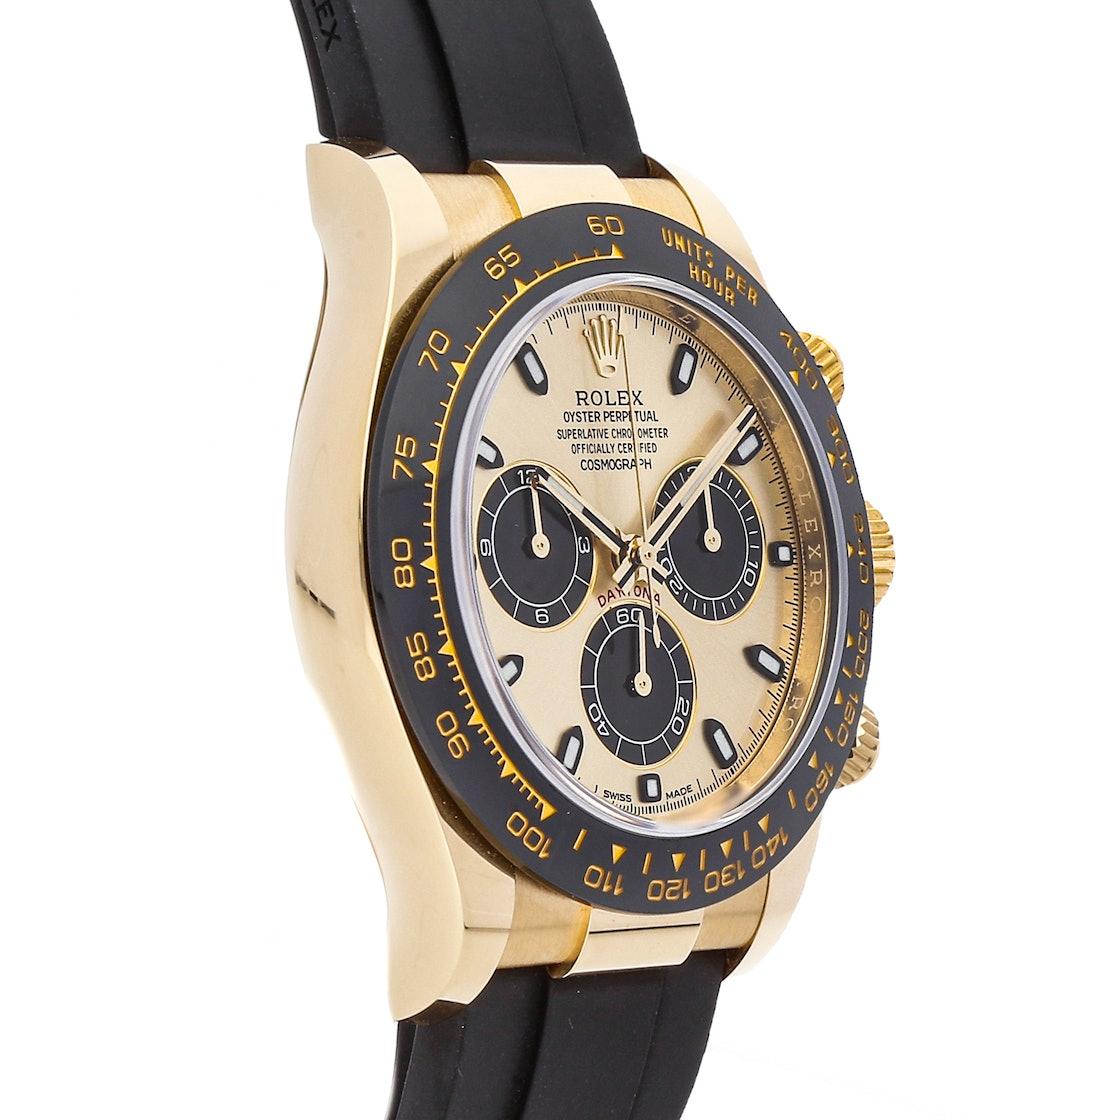 Rolex Daytona 116518LN